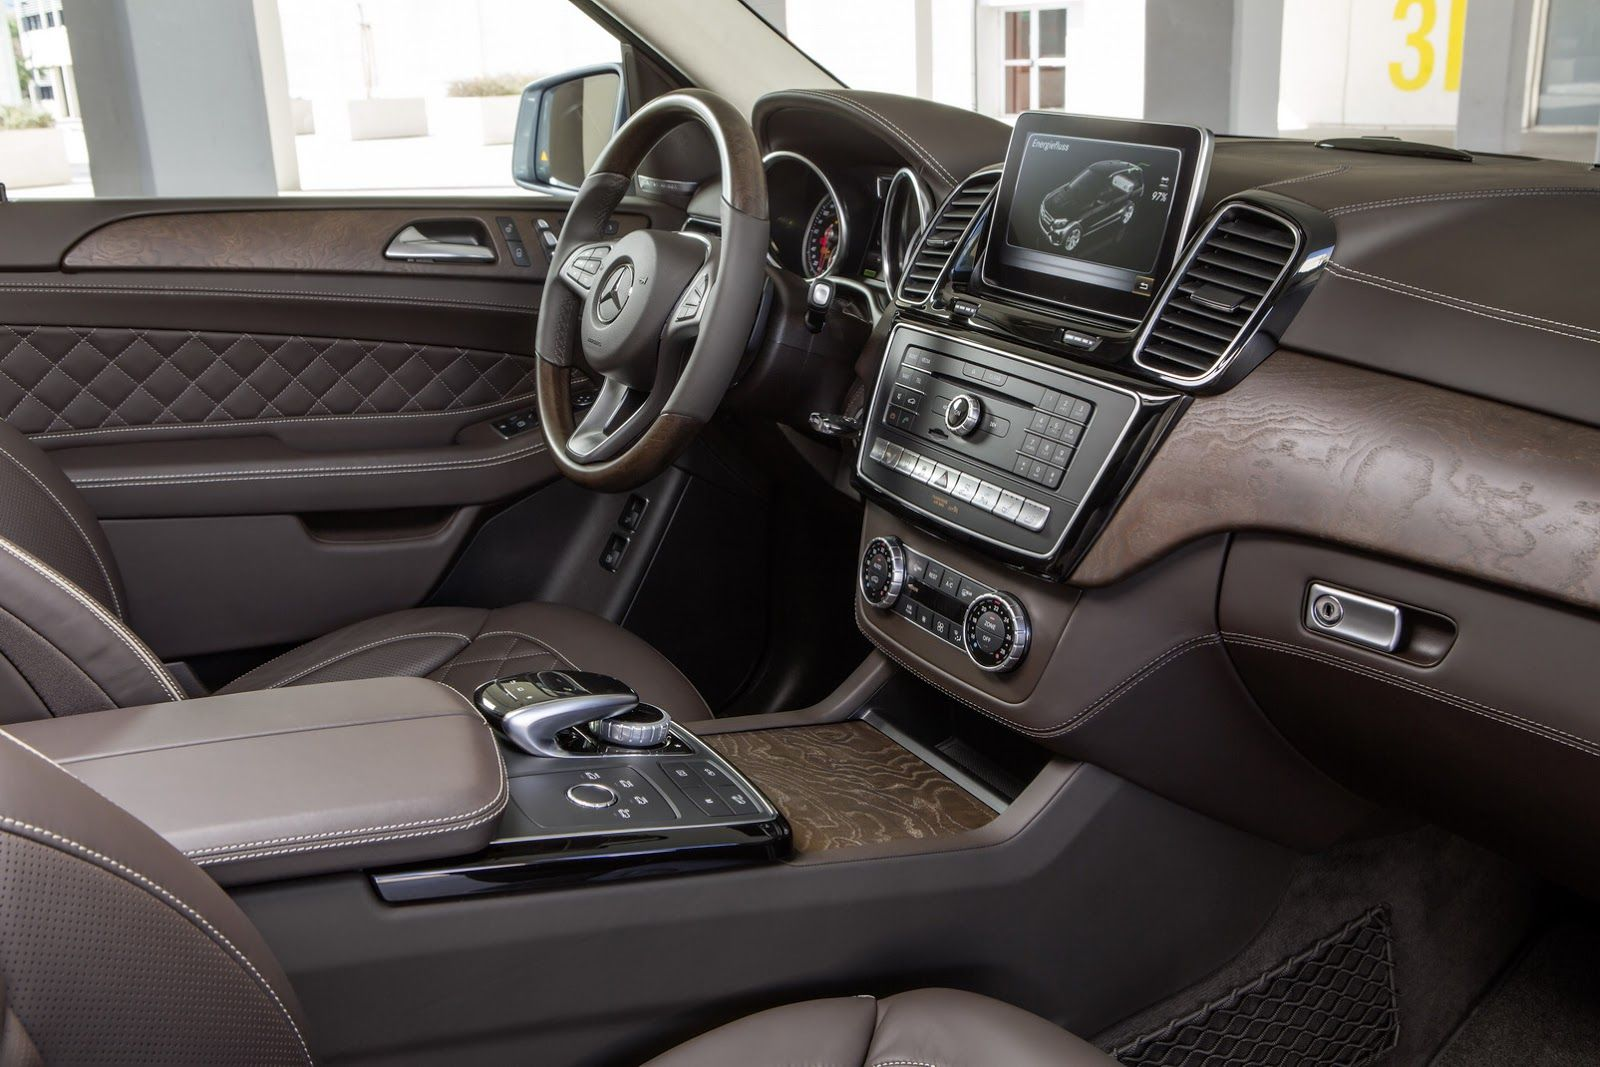 2018 Mercedes Benz Gle Review Mercedes Benz Gle Mercedes Benz